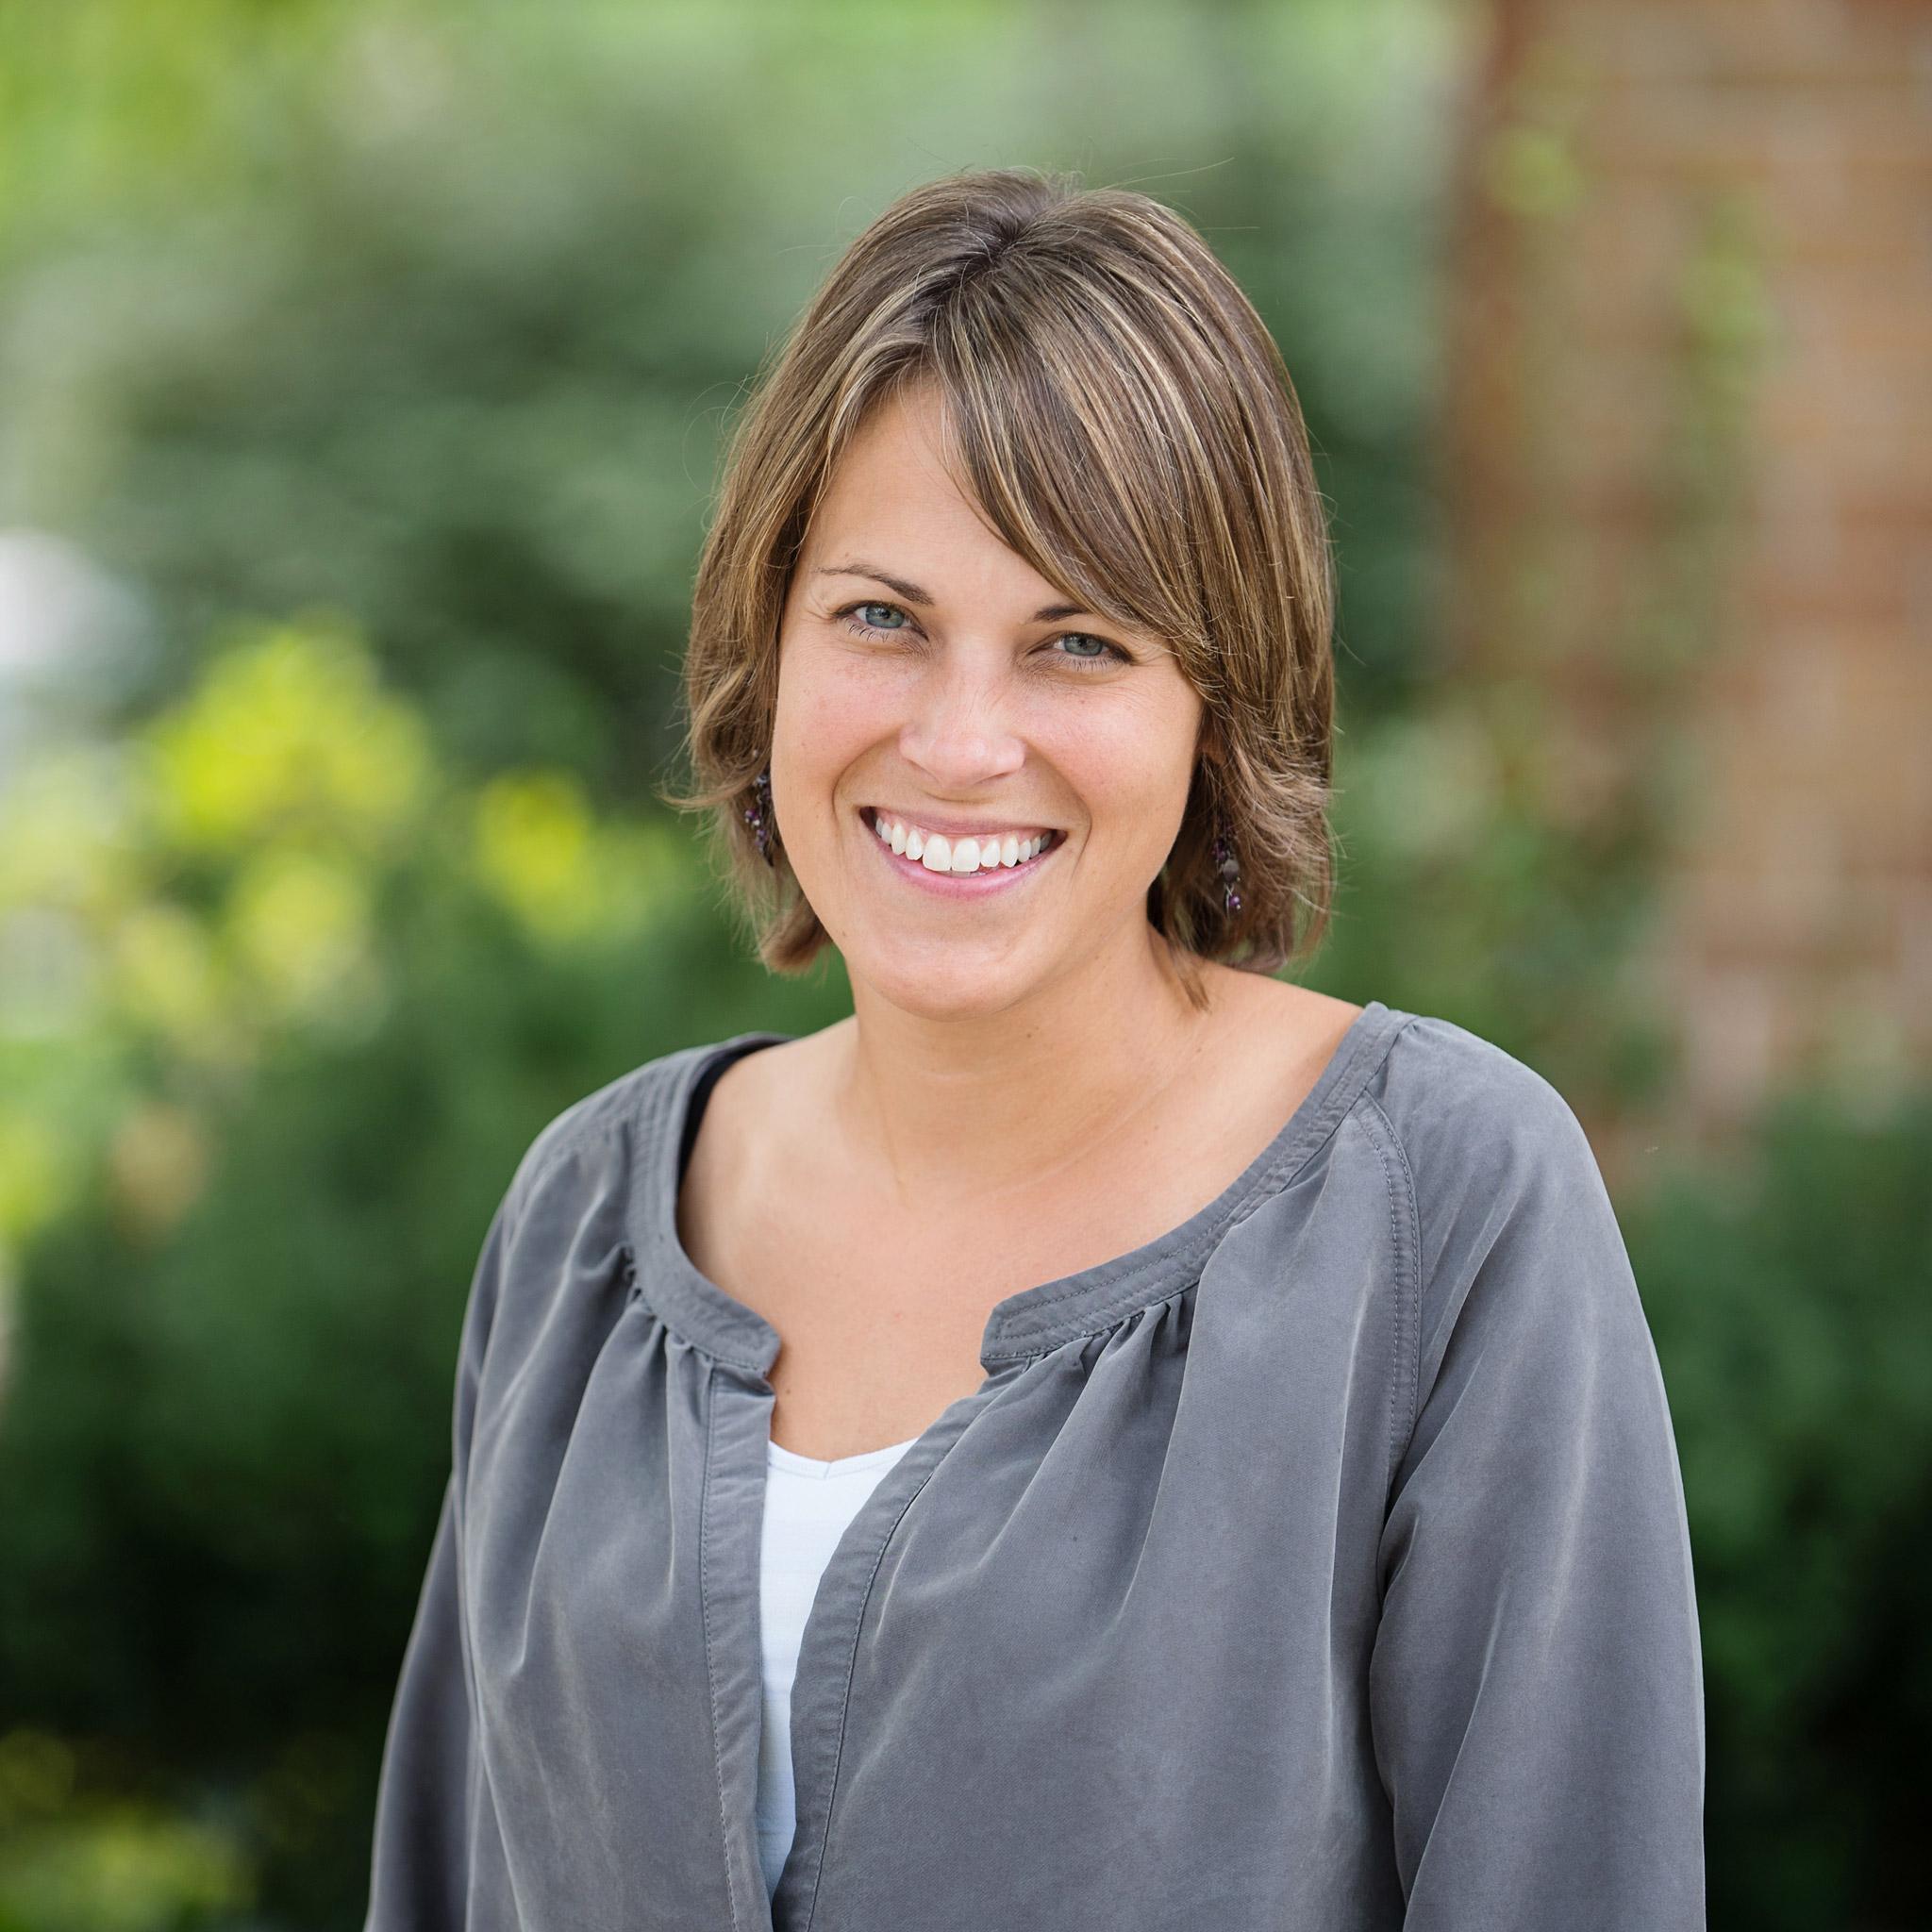 Emily DeBlecourt, BA